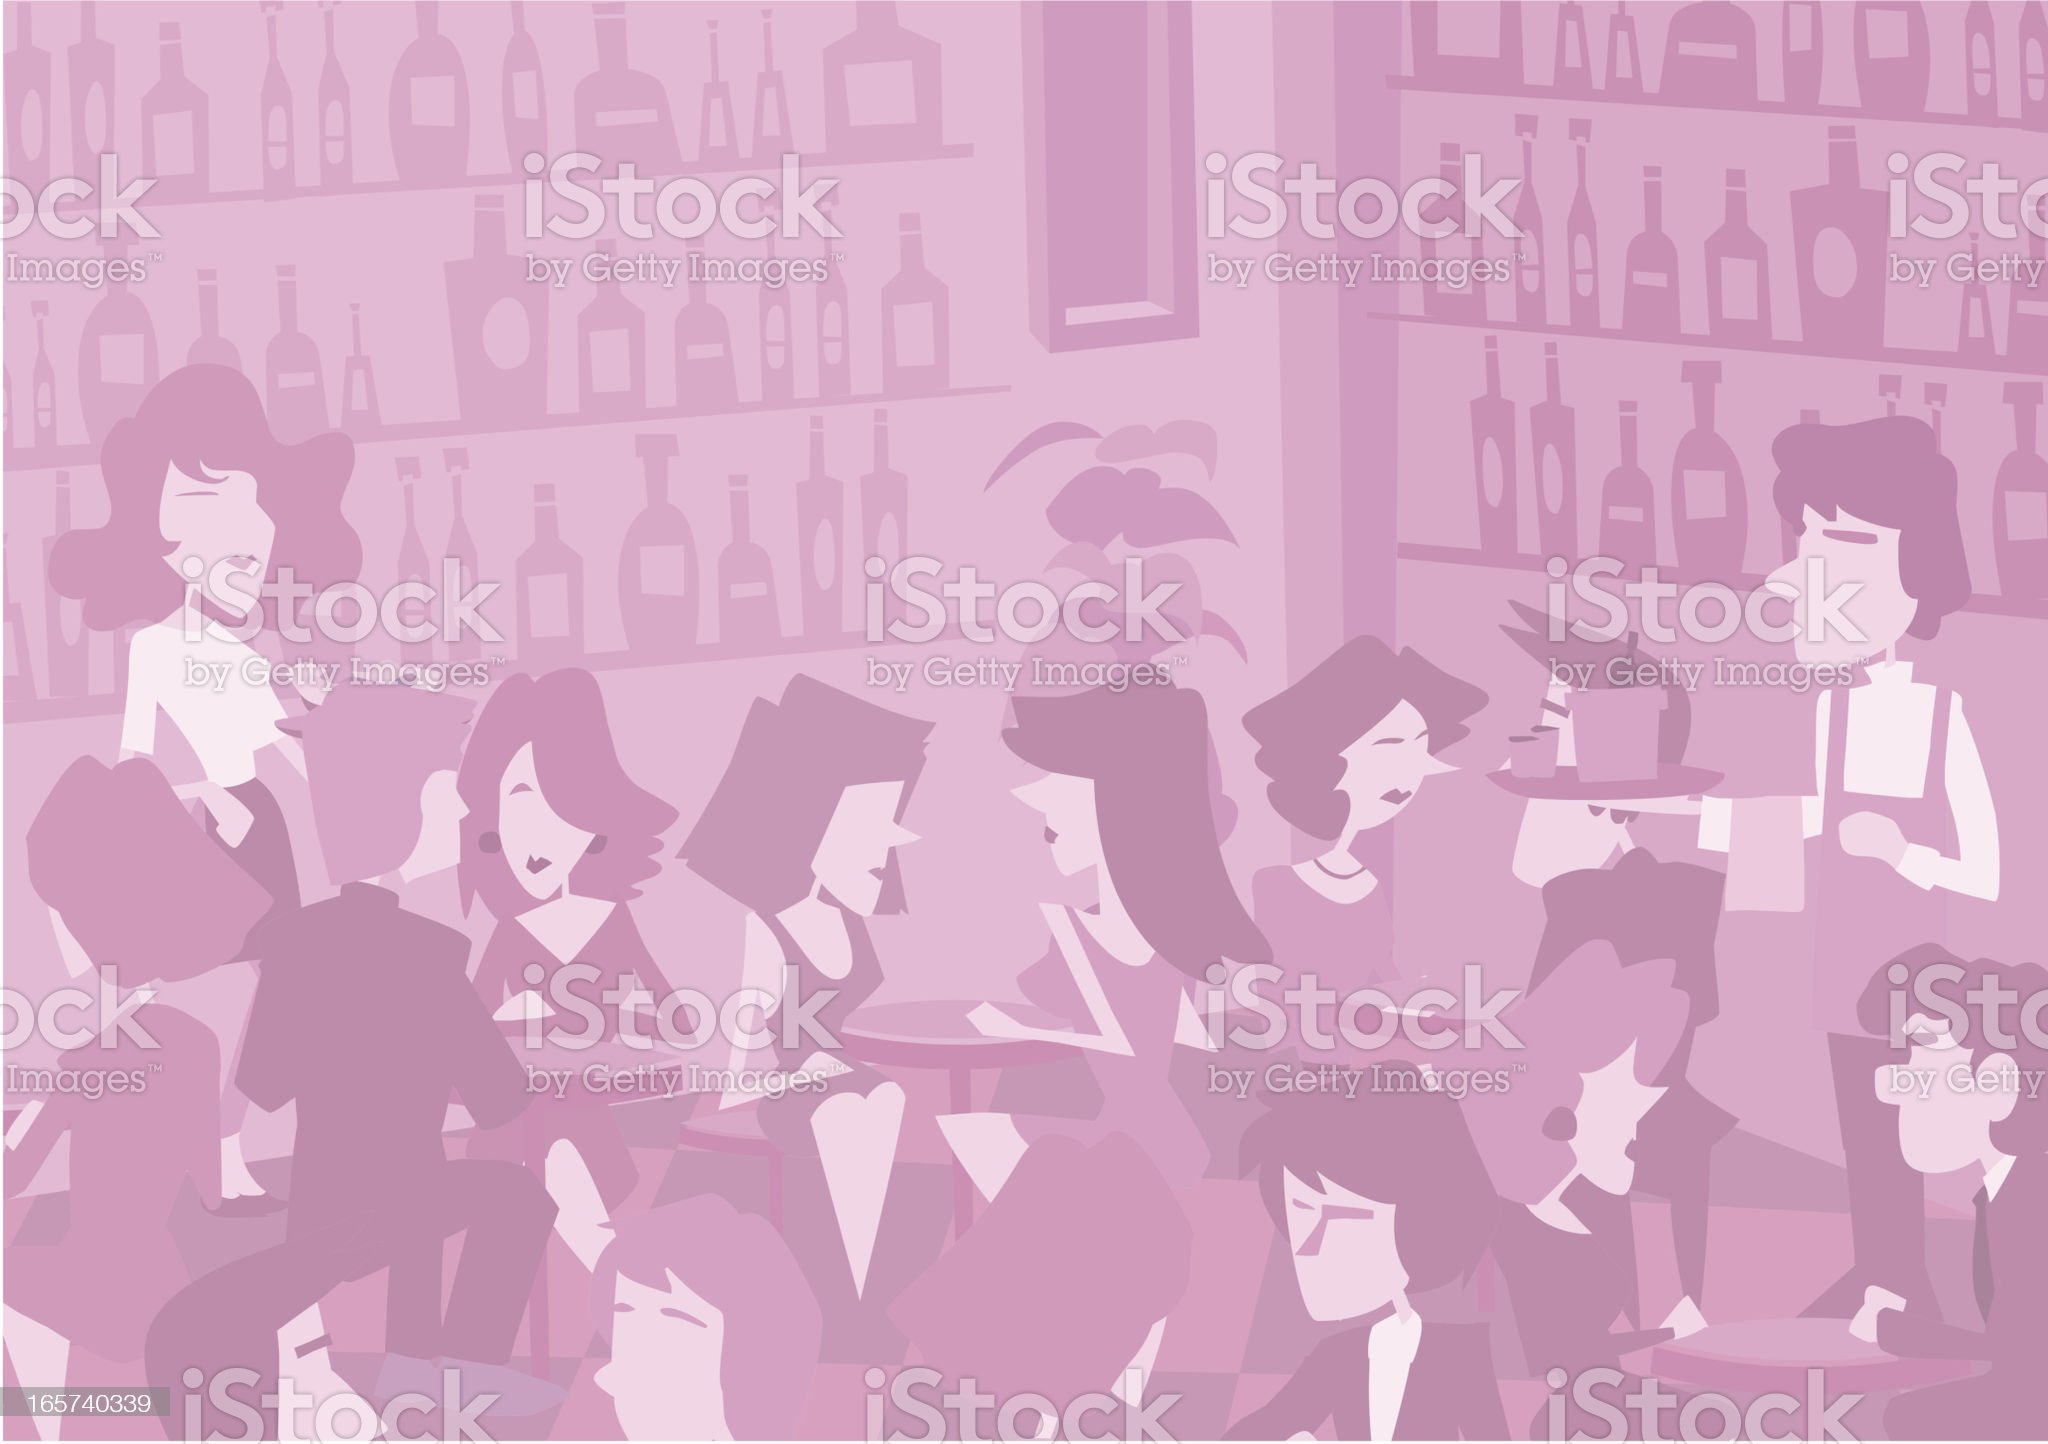 Subtle monotone bar background royalty-free stock vector art